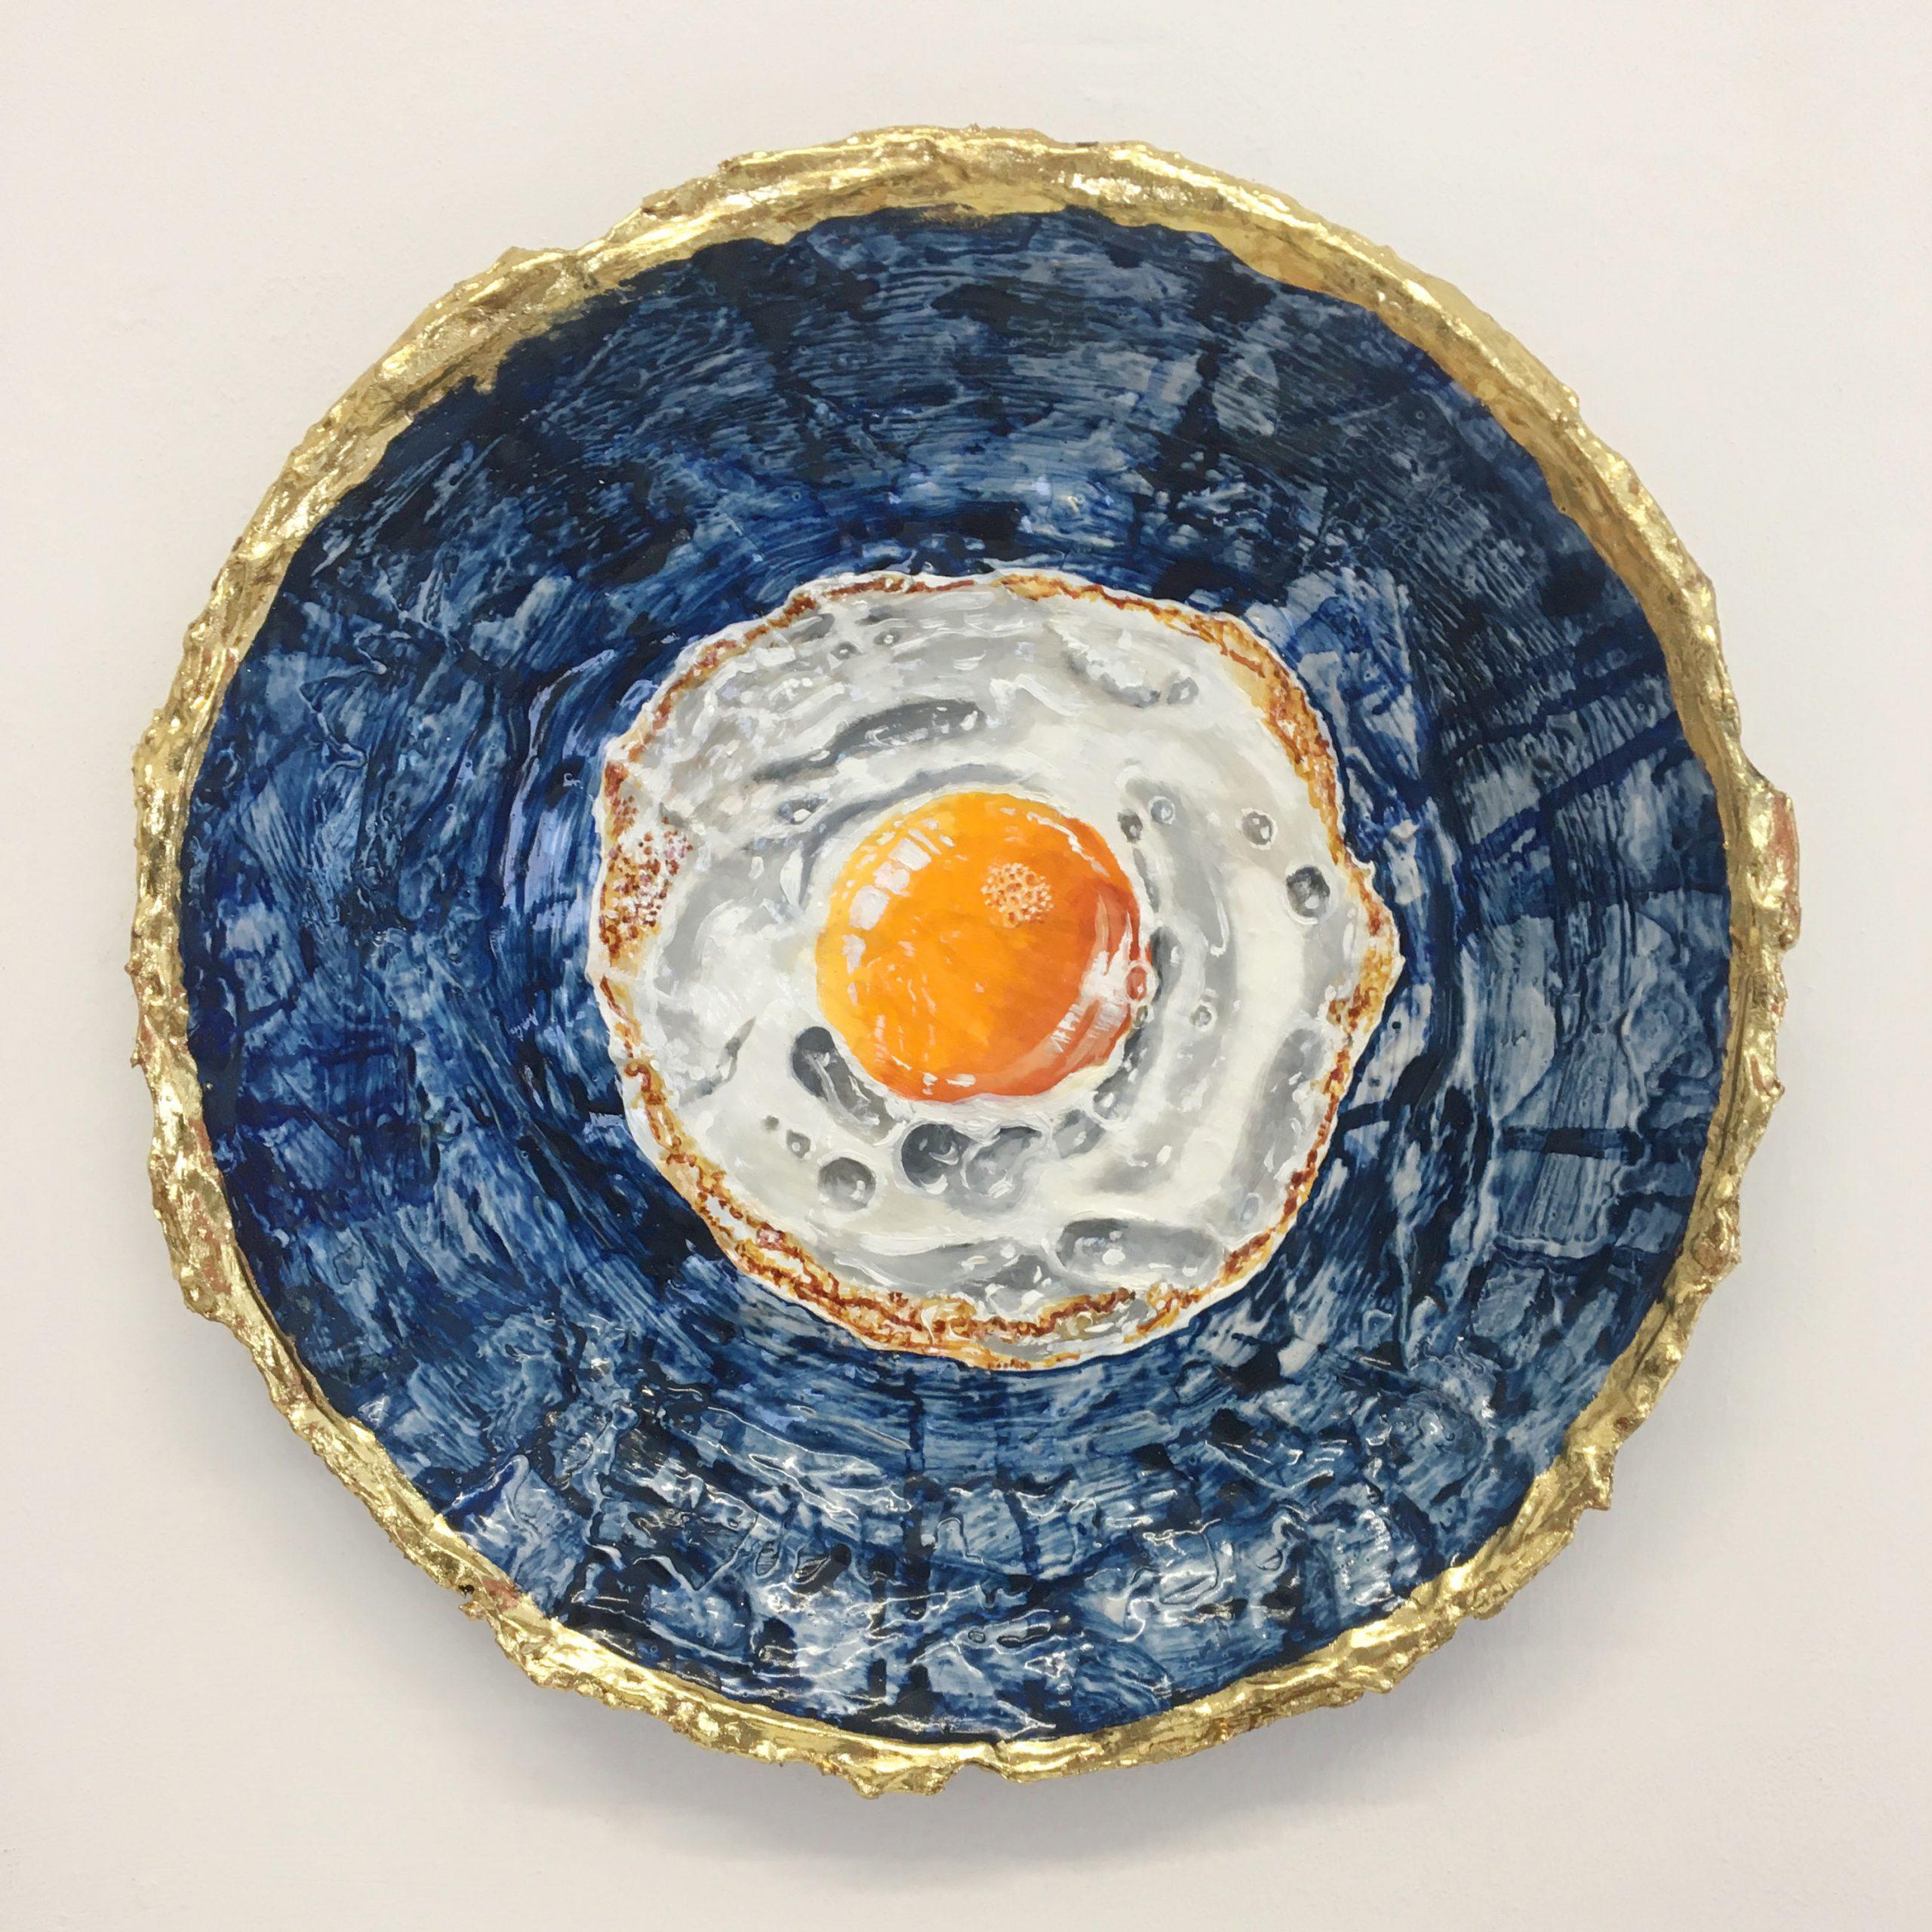 Kunst: Klein spiegelei 7 van kunstenaar Katinka Krijgsman